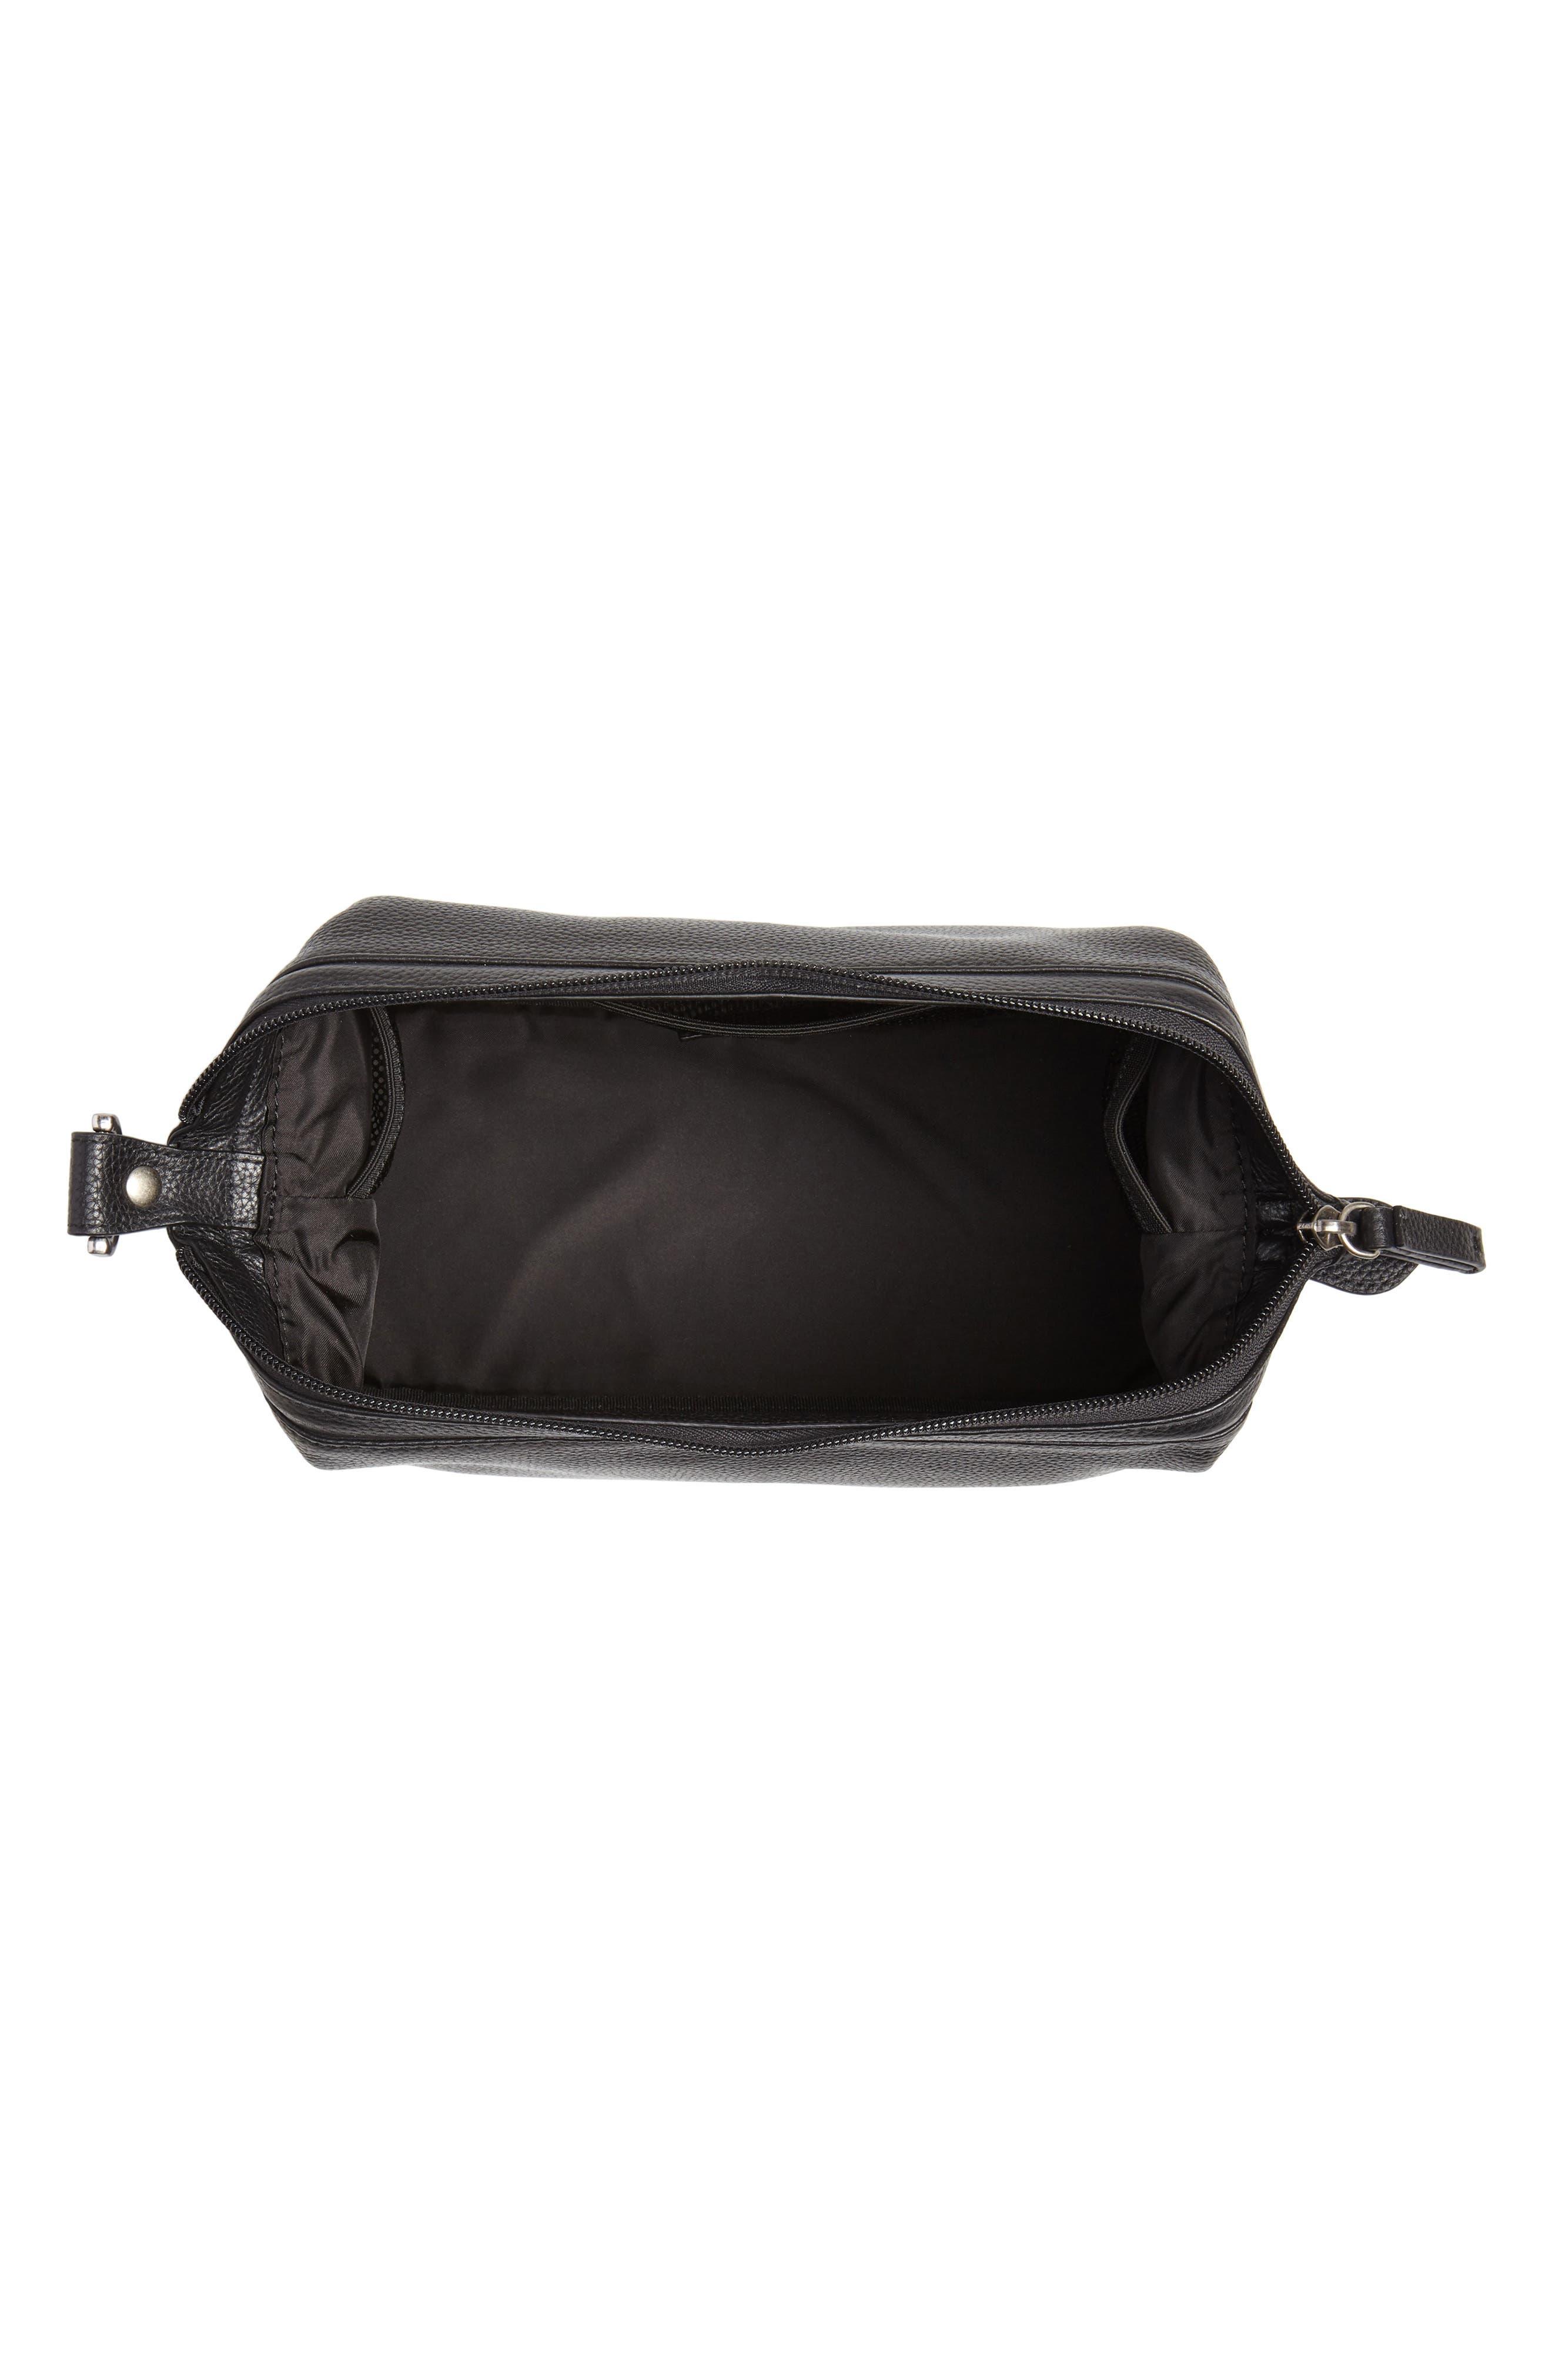 Midland Leather Dopp Kit,                             Alternate thumbnail 3, color,                             BLACK